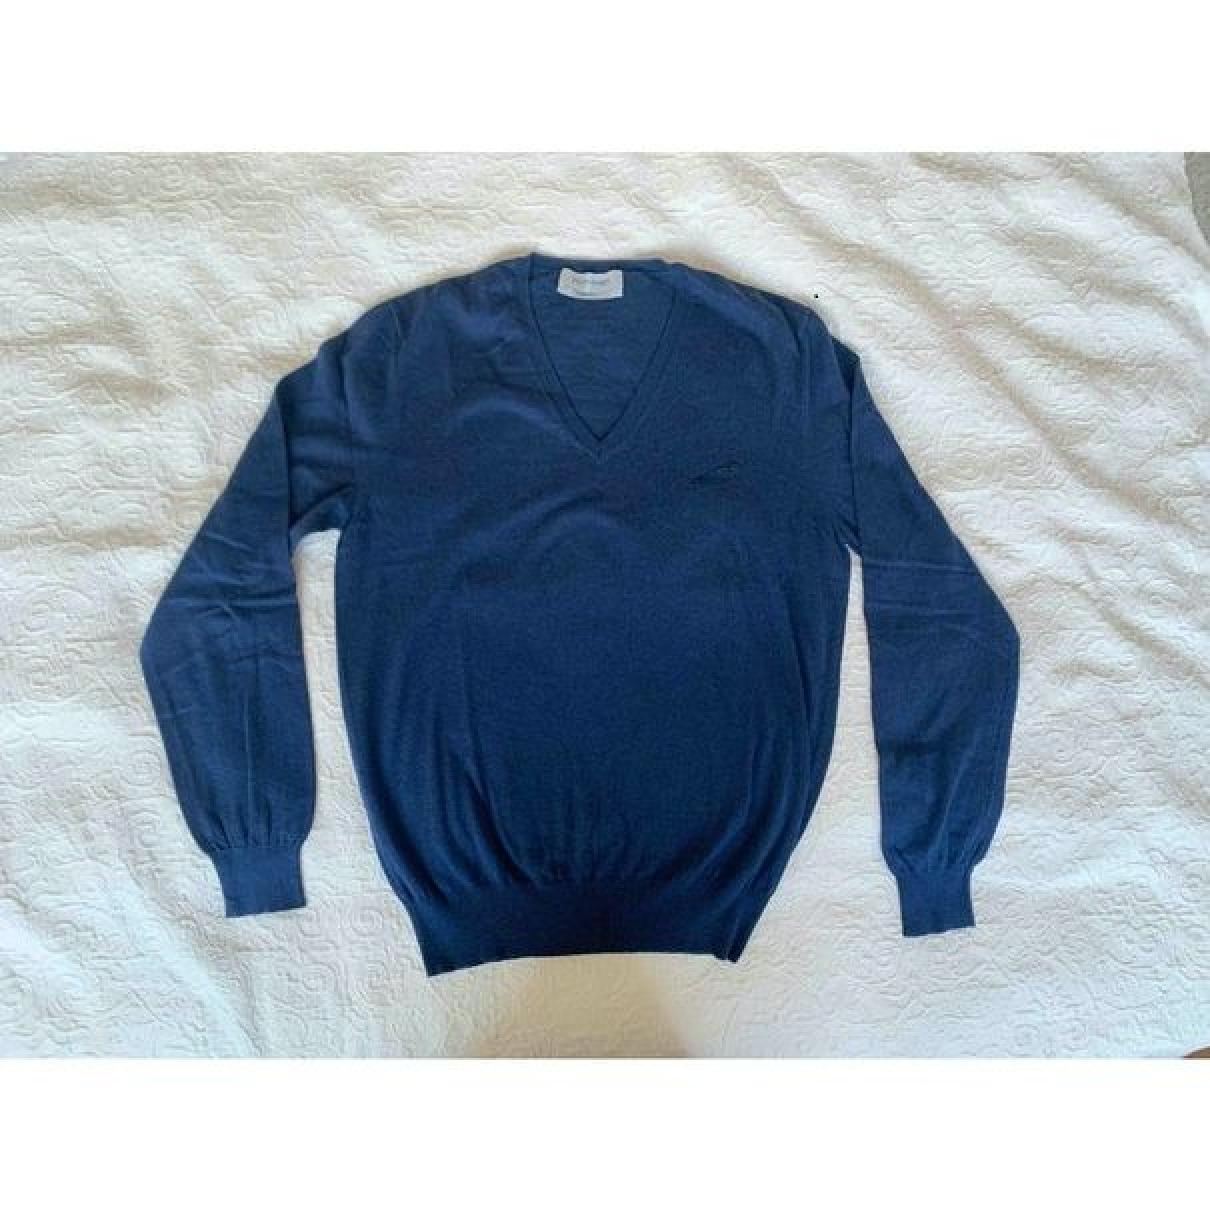 Yves Saint Laurent N Blue Cotton Knitwear & Sweatshirts for Men M International